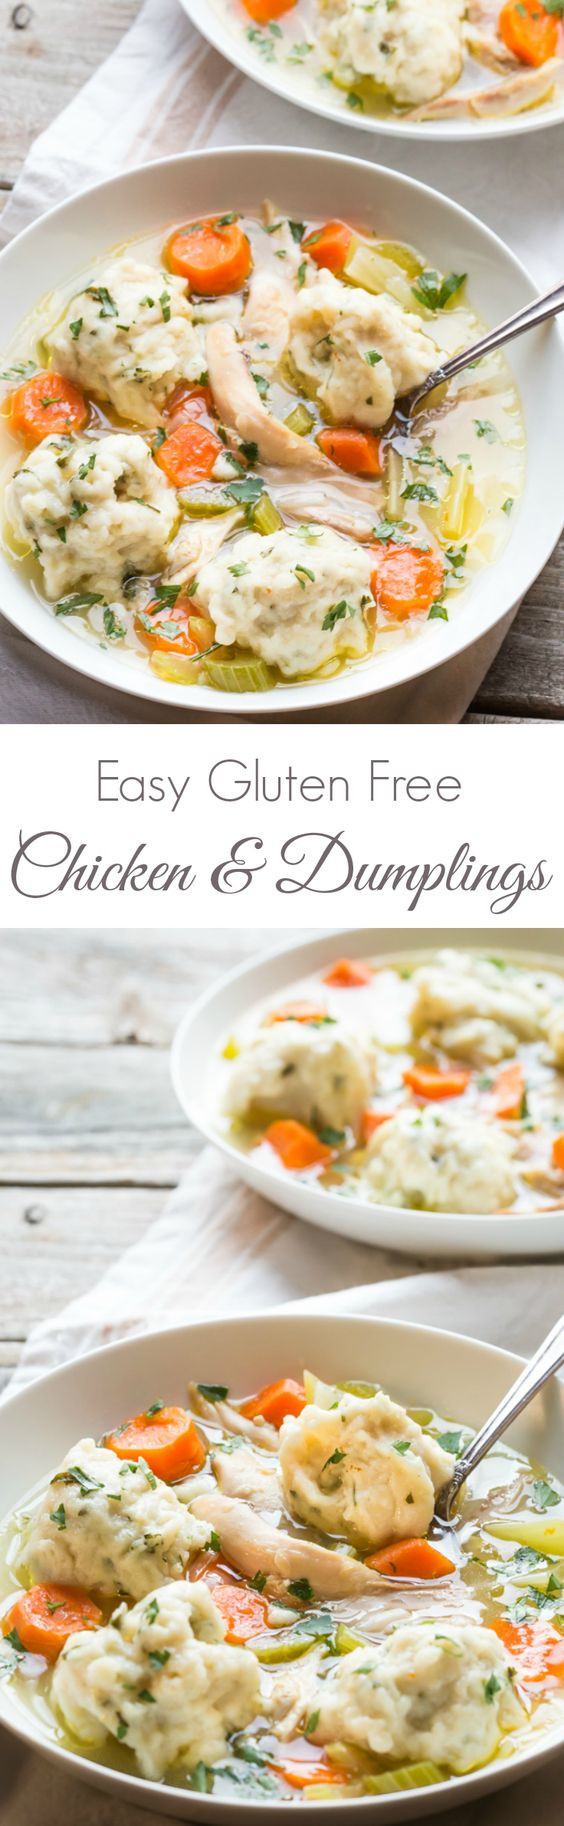 Easy Gluten Free Chicken Recipes  Chicken and dumplings Powder and Gluten free on Pinterest